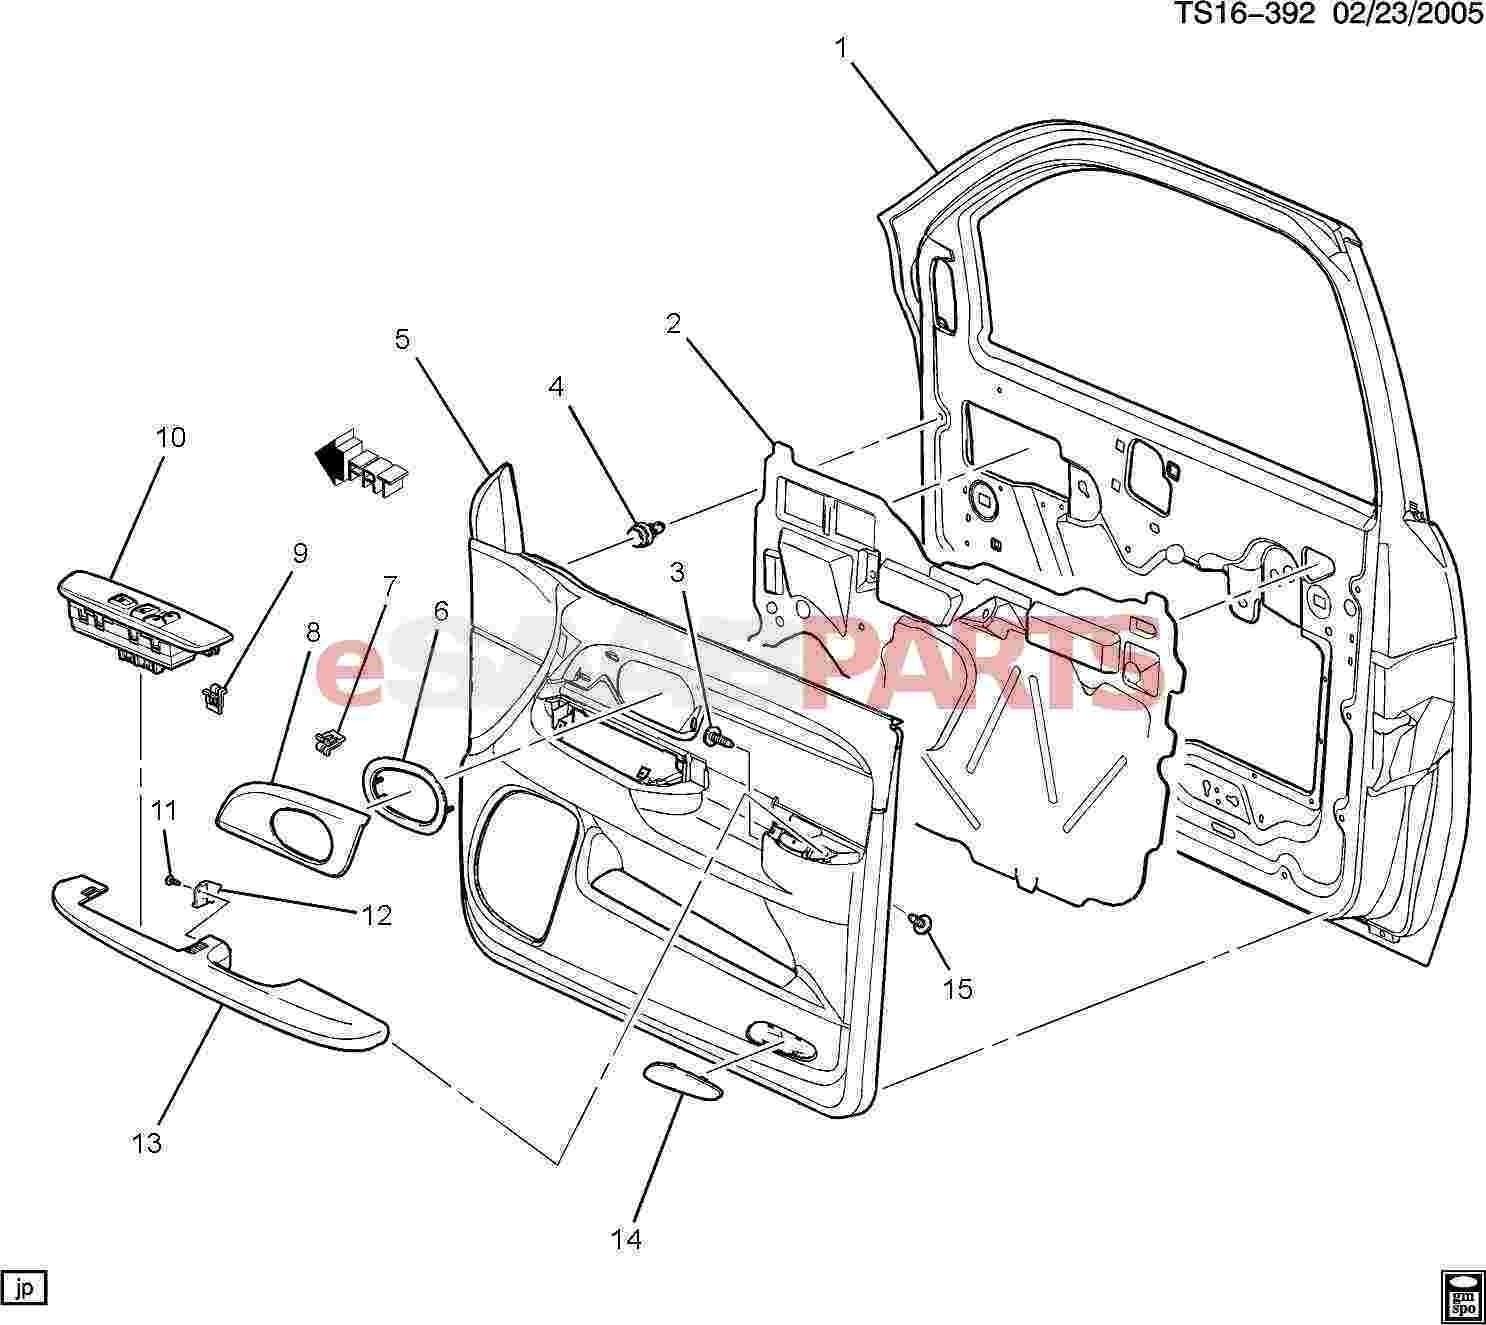 Car Engine Labeled Diagram Diagram Parts Under A Car Diagram Car Engine Parts ] Saab Bolt Of Car Engine Labeled Diagram